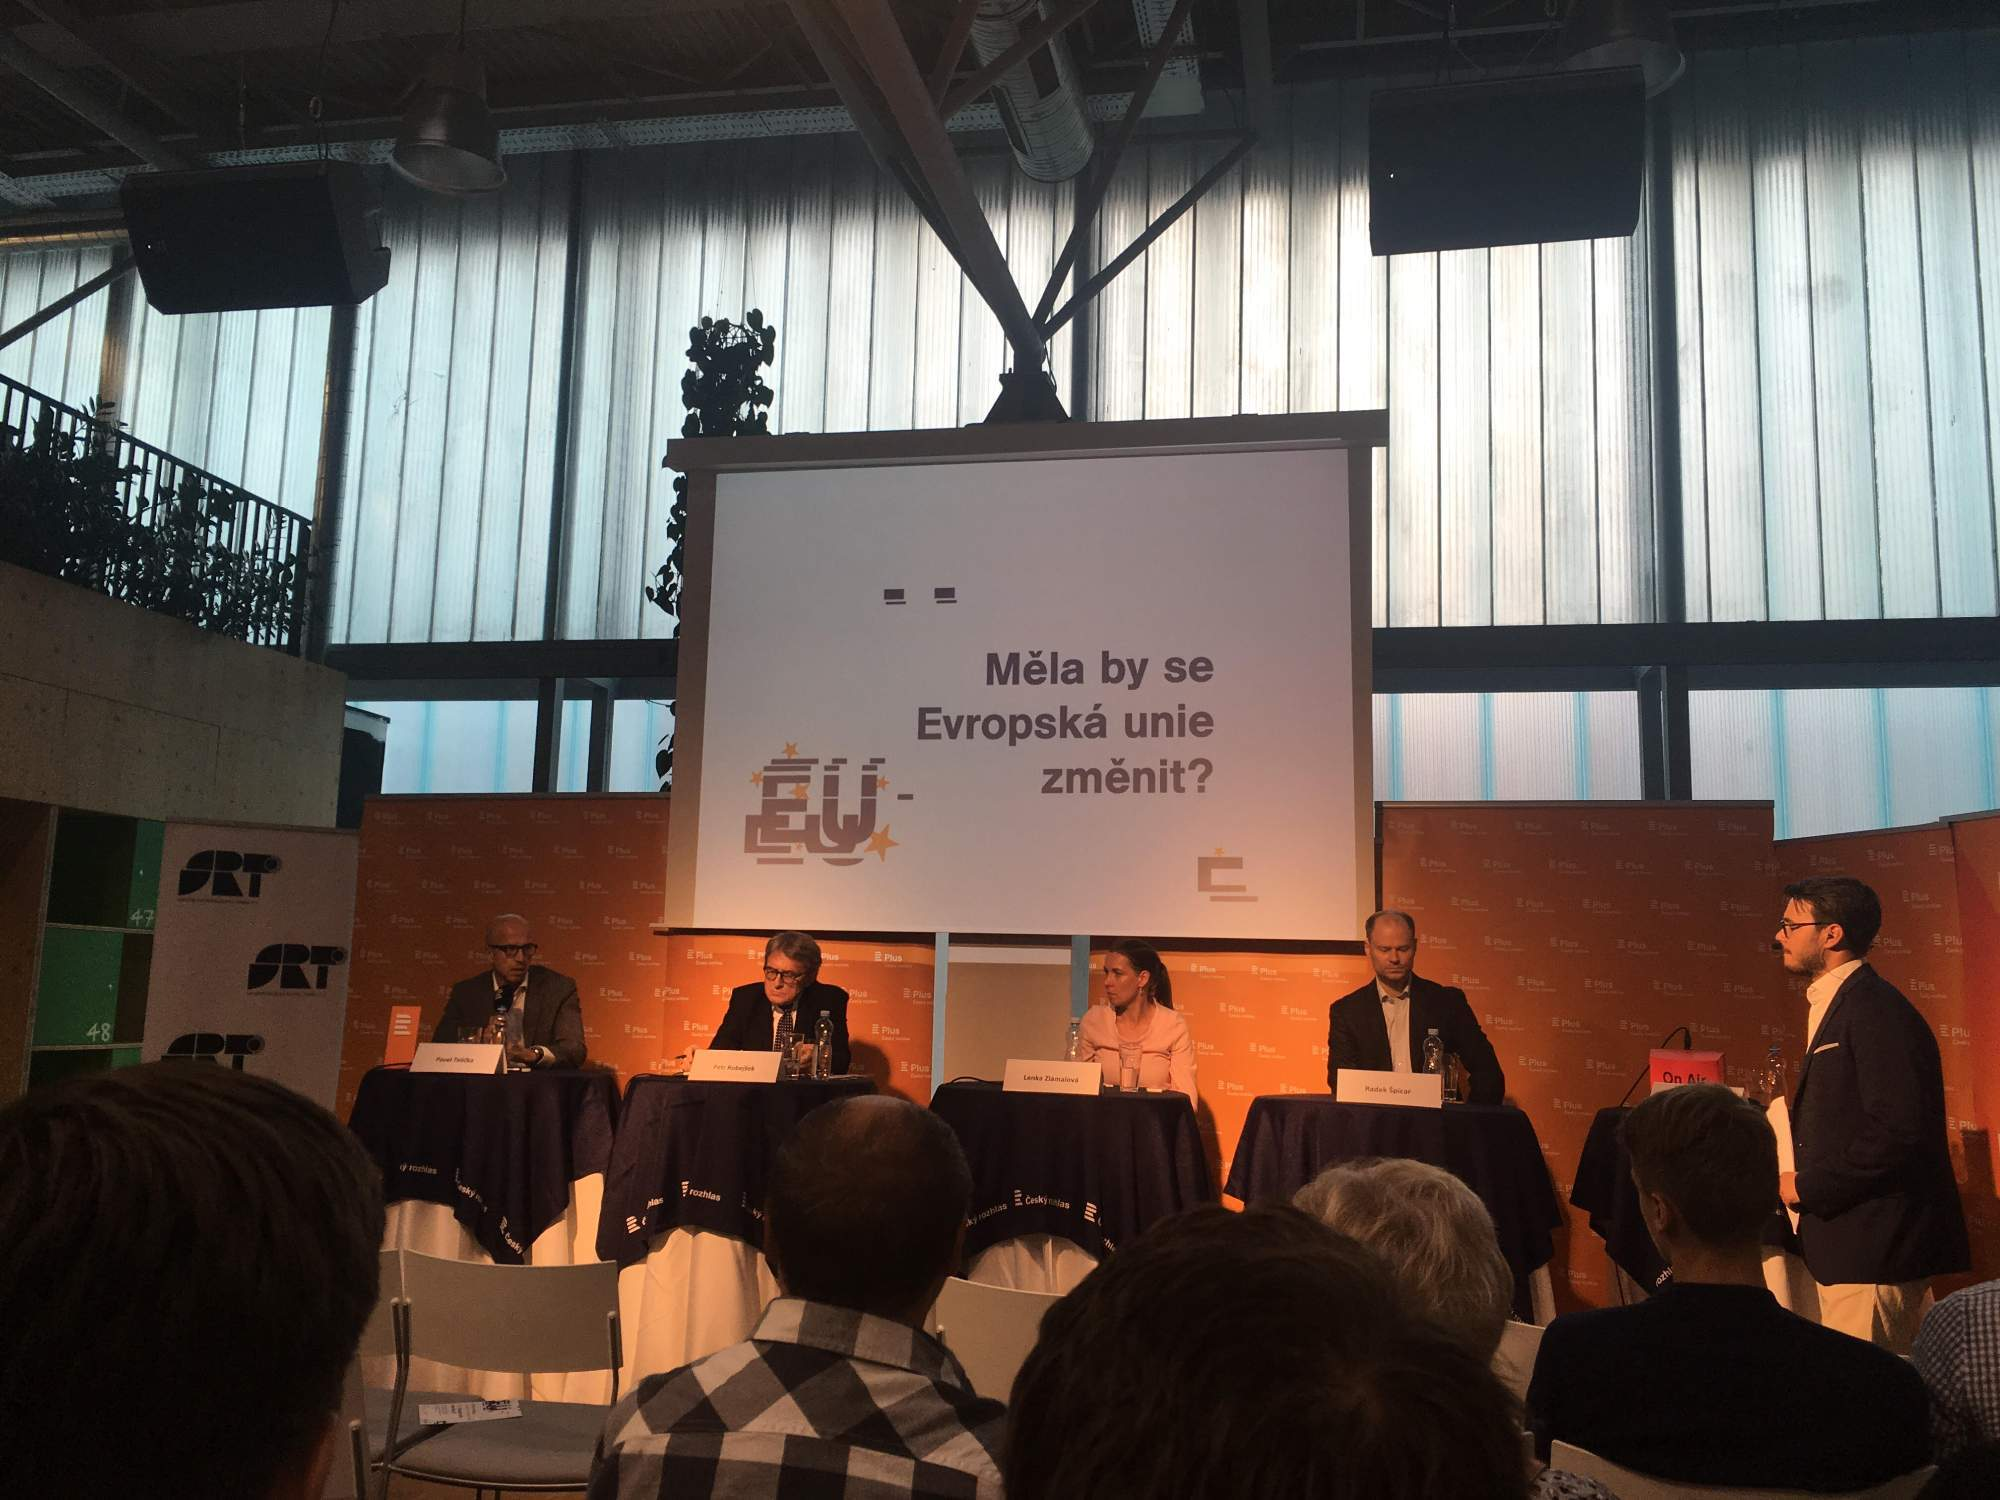 Pavel Telička, Petr Robejšek, Lenka Zlámalová a Radek Špicar přijeli diskutovat o problémech Evropské unie, FOTO: Karolína Oškerová